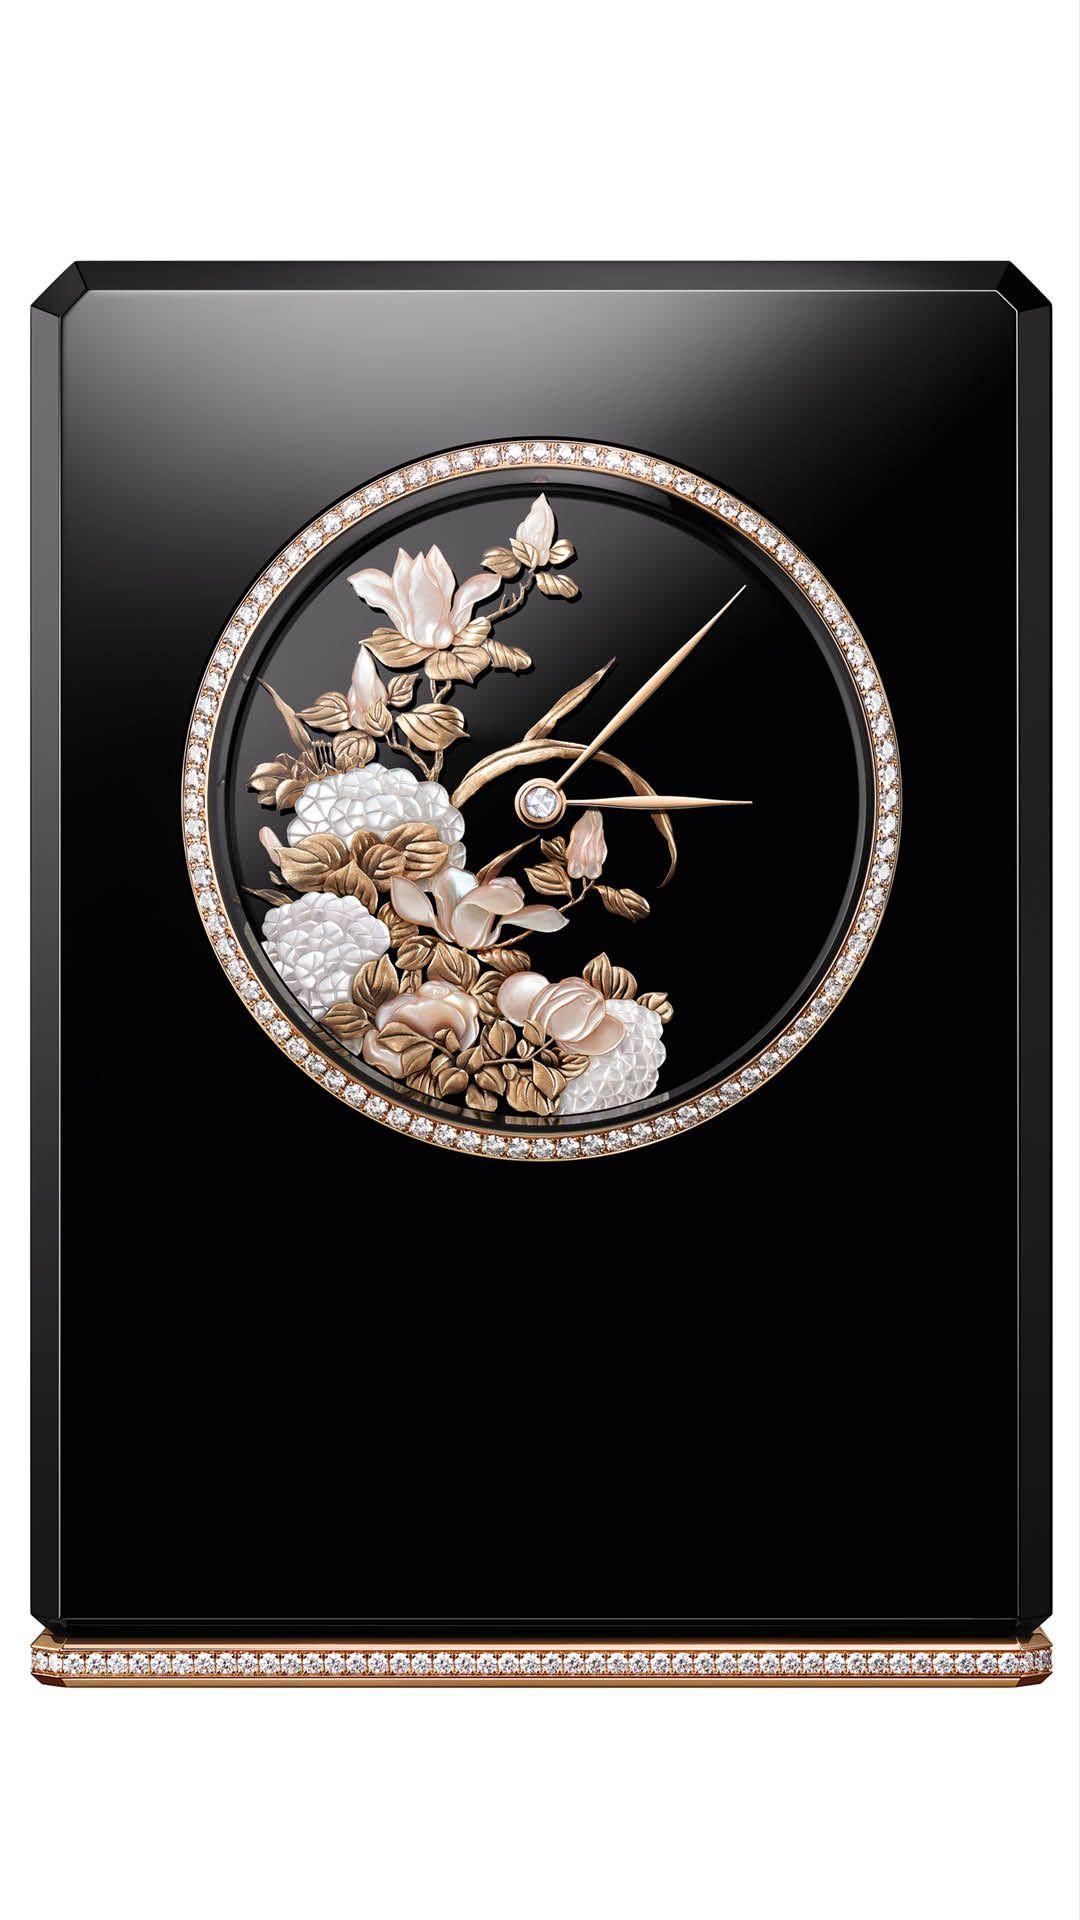 Mademoiselle-Prive-Desk-Clock